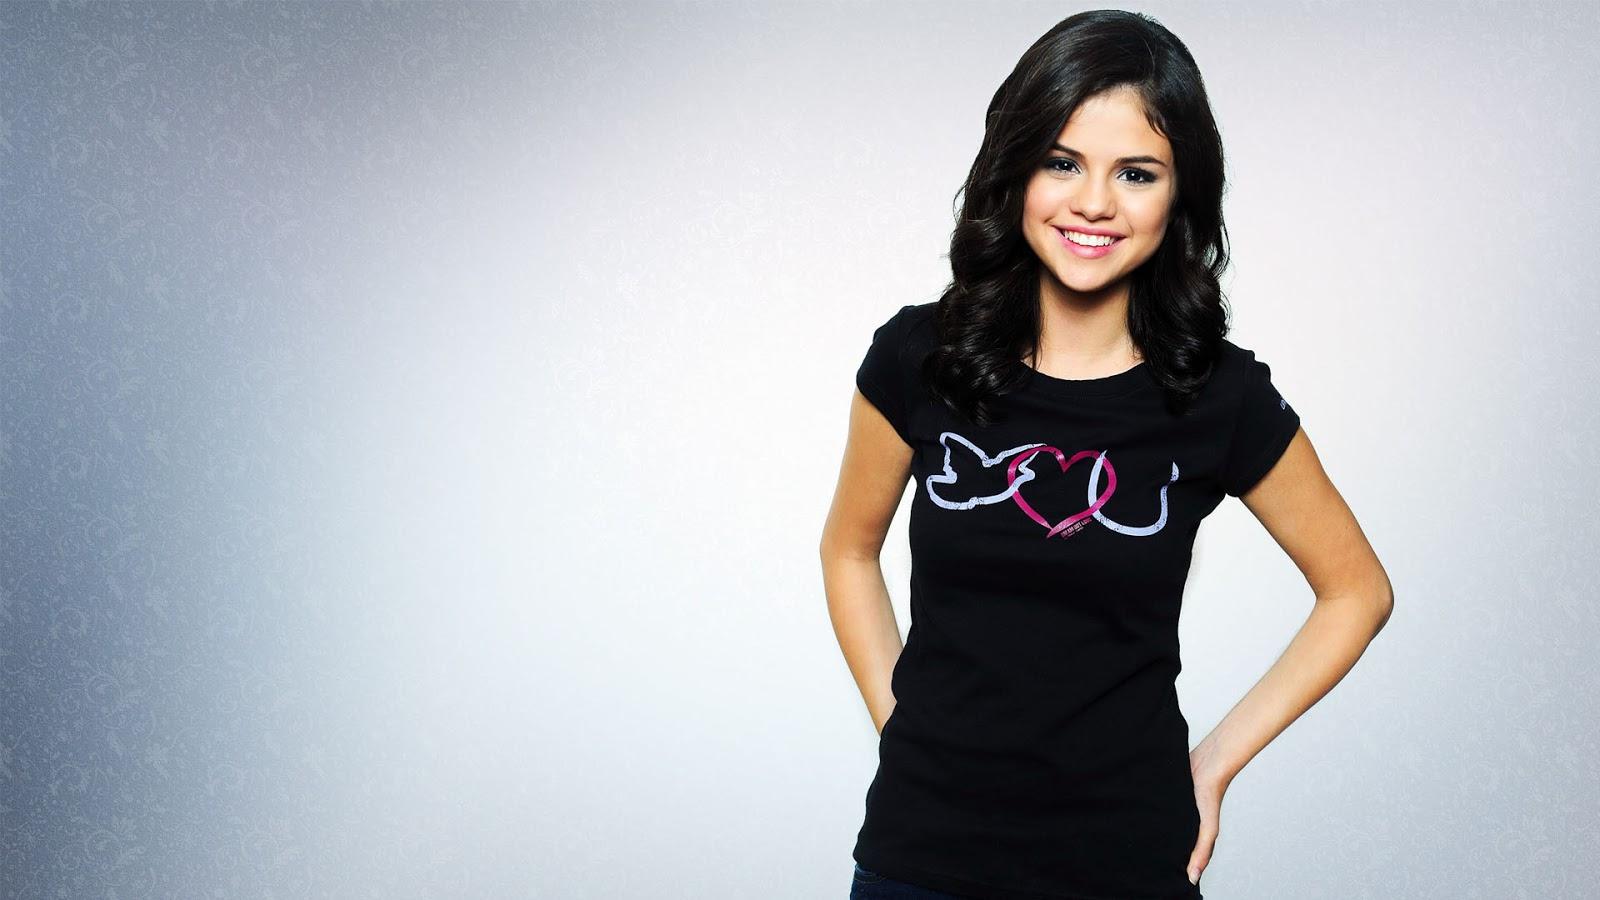 Selena Gomez Latest Full Hd Wallpapers